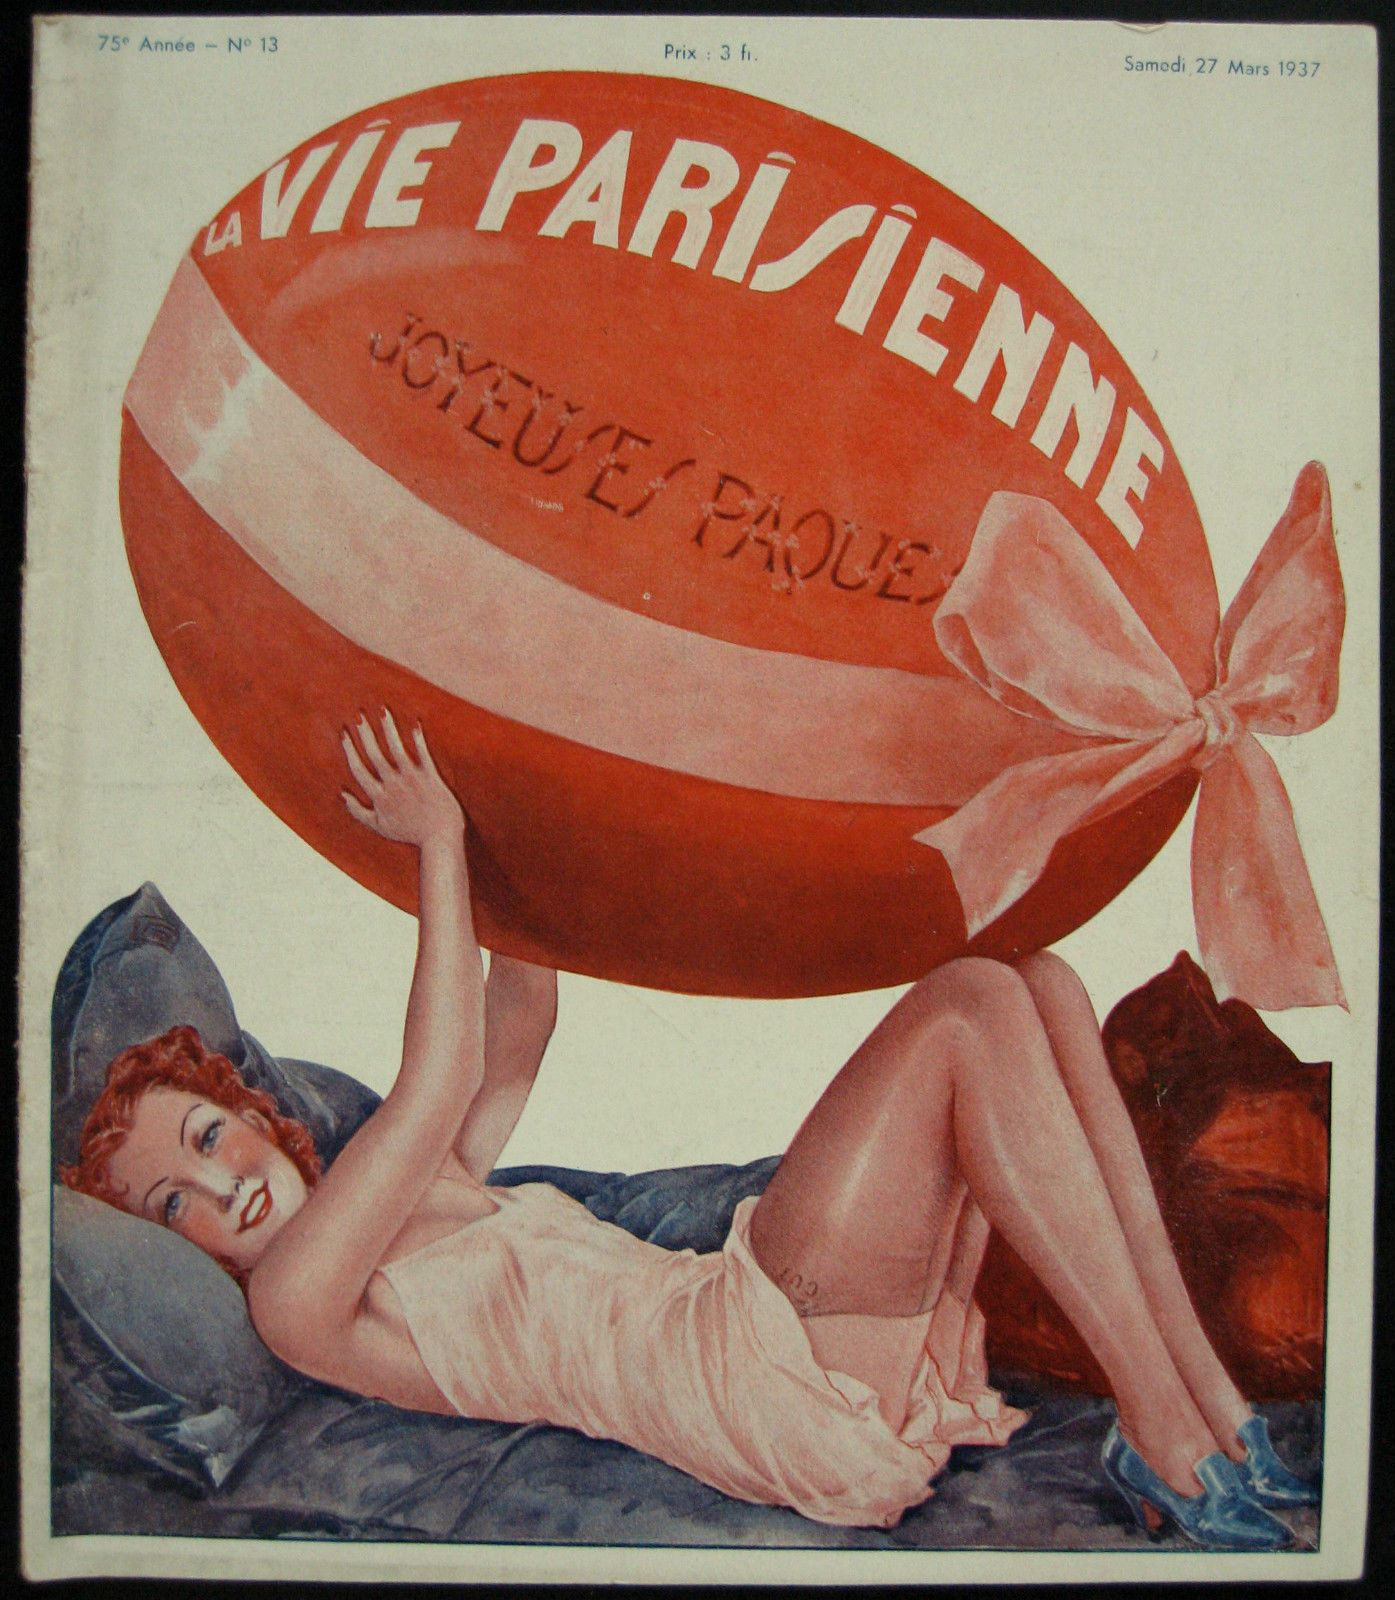 Georges Léonnec (1881 – 1940). La Vie Parisienne, 27 Mars 1937. [Pinned 23-vii-2015]